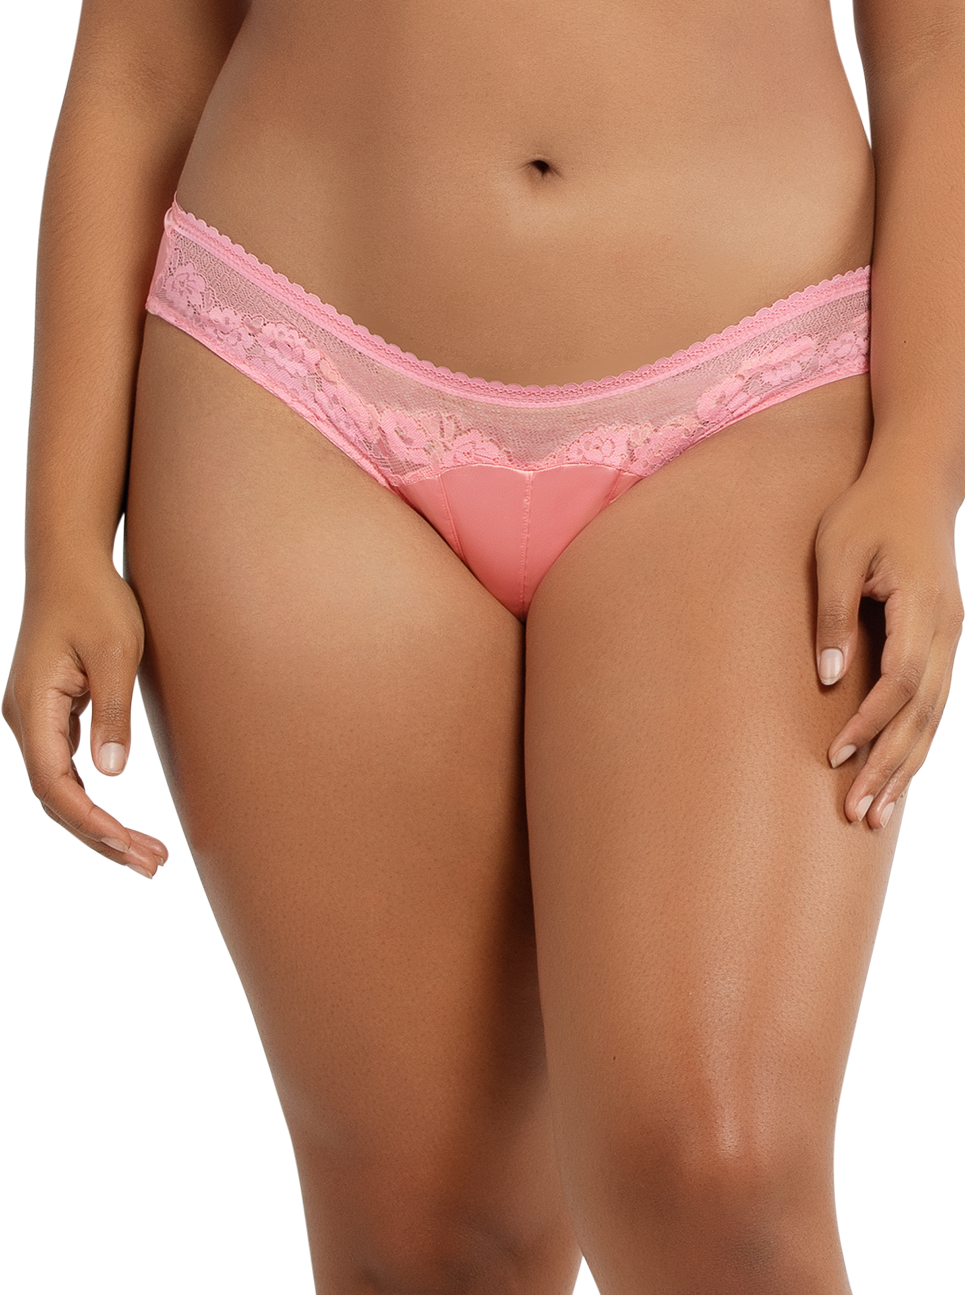 PARFAIT Jade BikiniA1653 FlamingoPink Front - Jade Bikini Flamingo Pink P1653